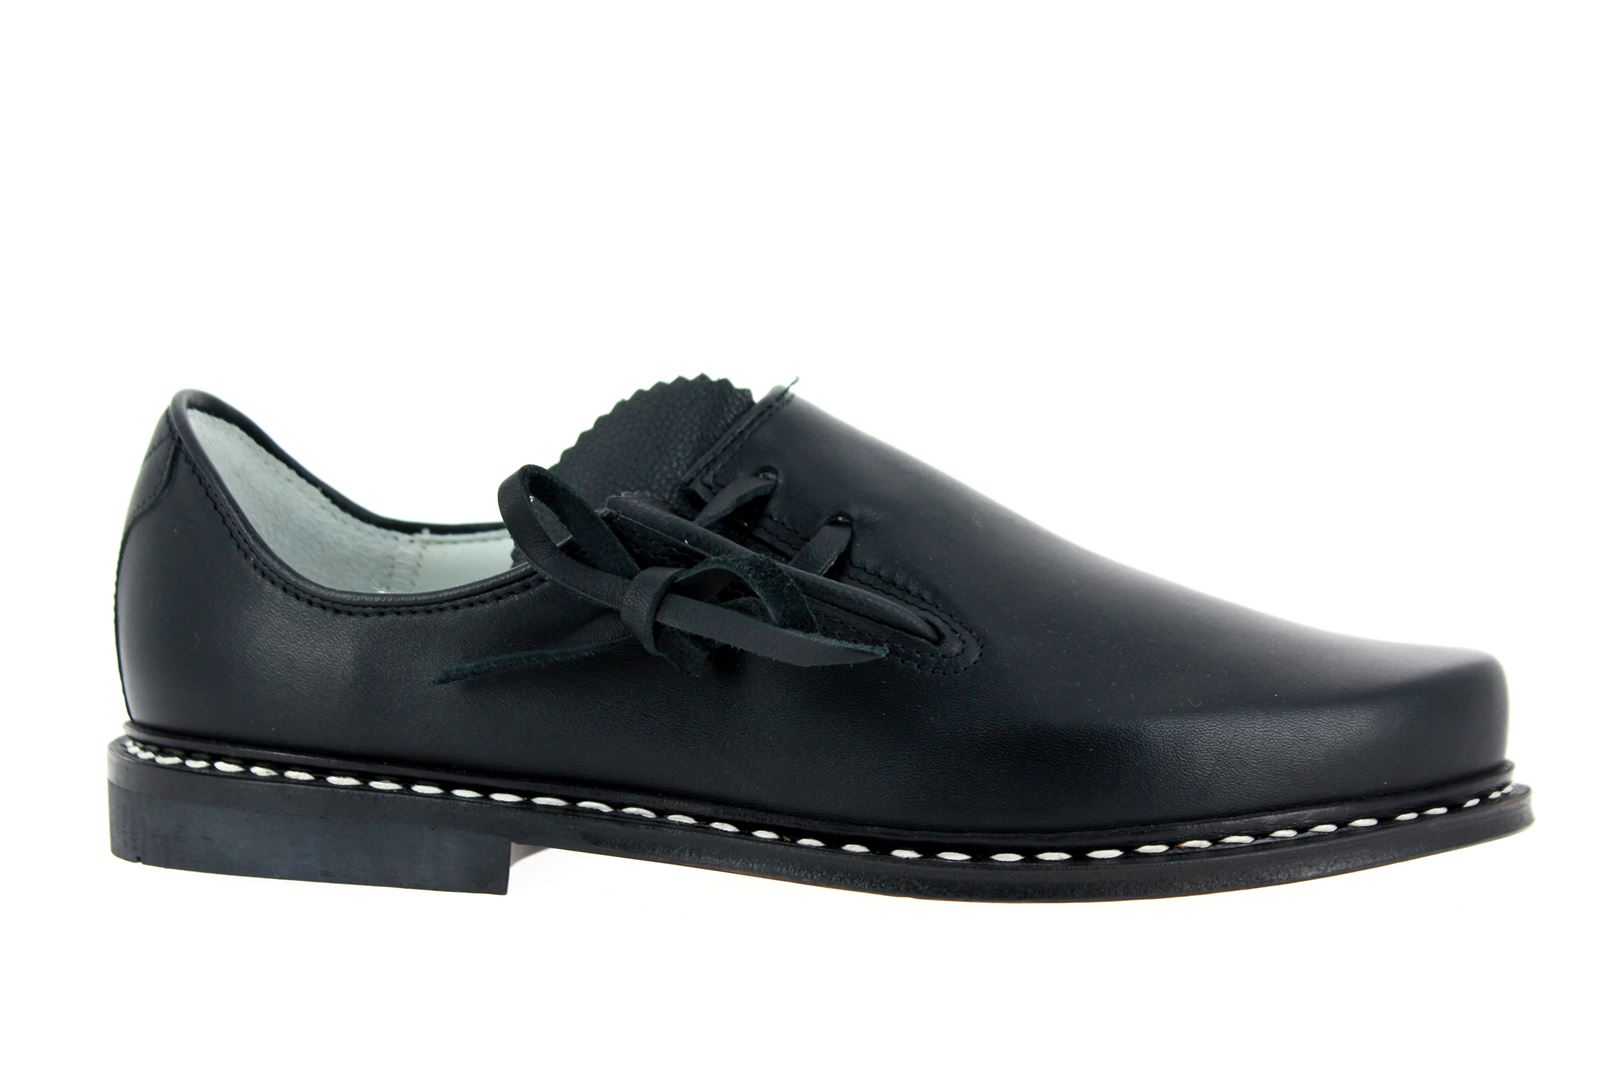 Meindl Traditional Shoe KÖSSEN BLACK BOXCALF